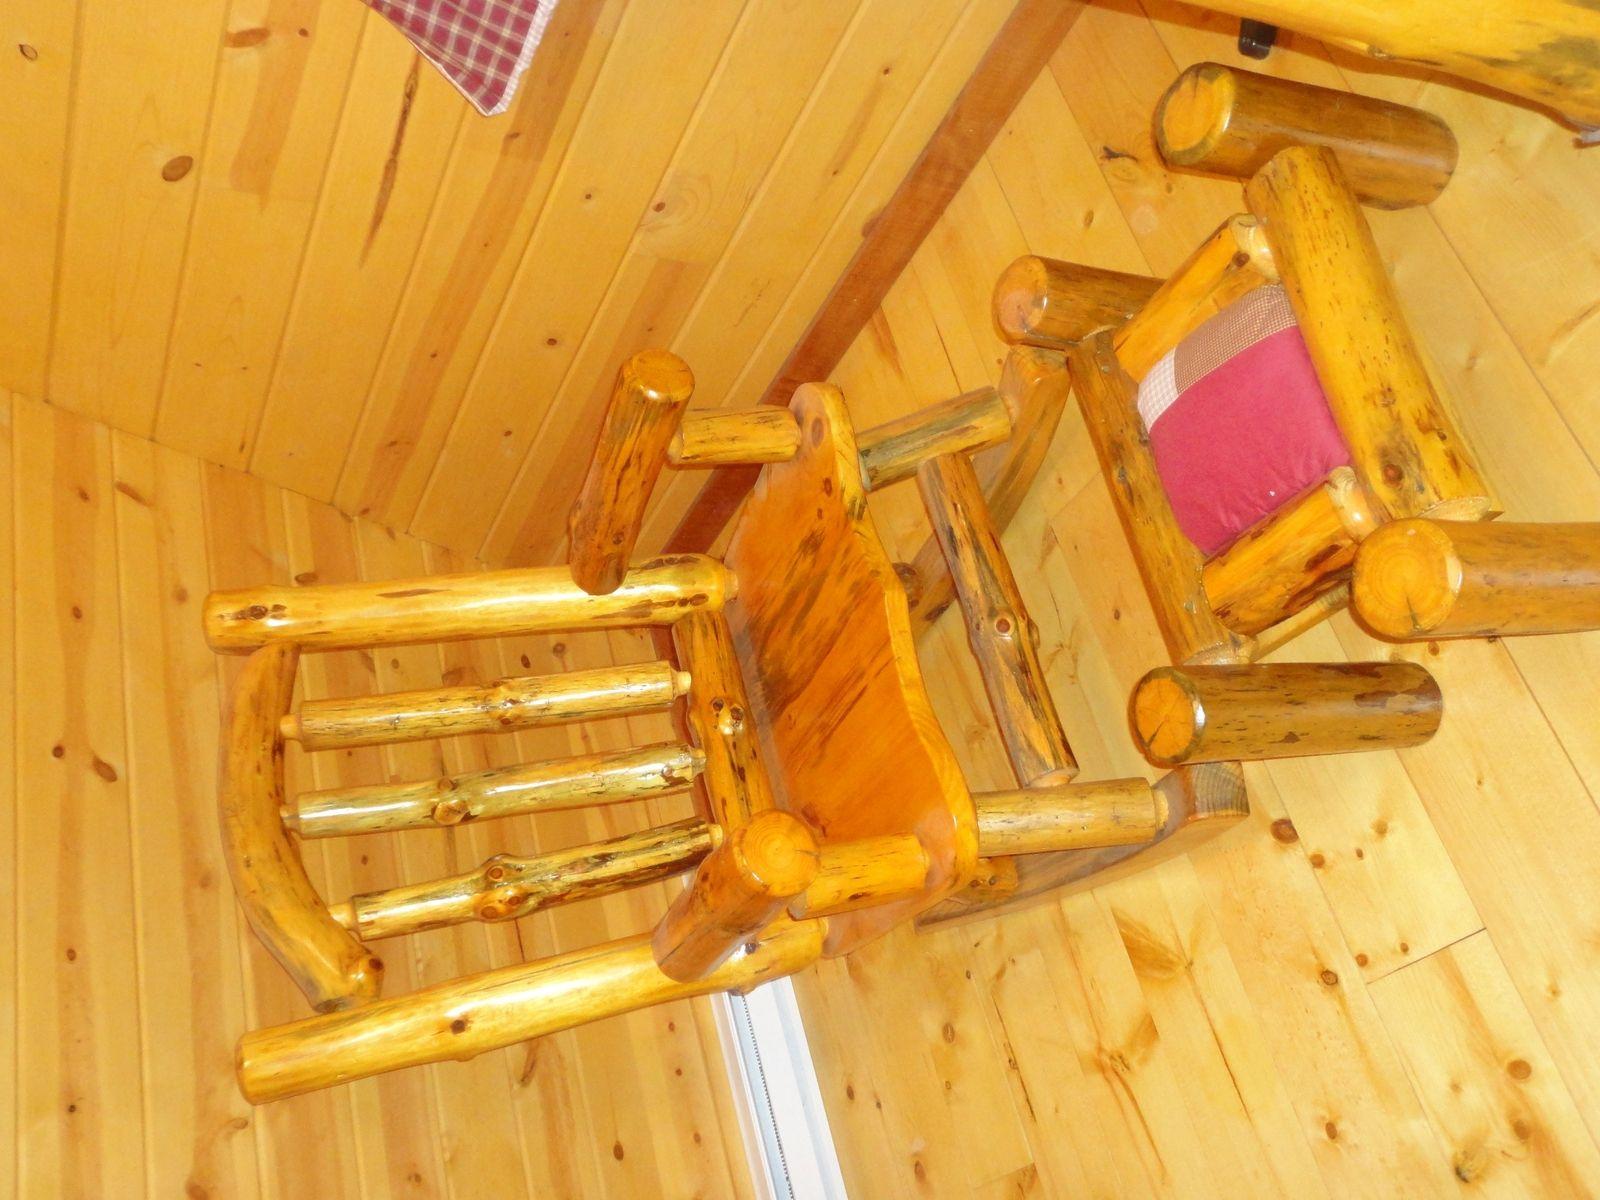 rocking chairs nursery ireland cane back chair custom made rustic pine by legacy woodshop